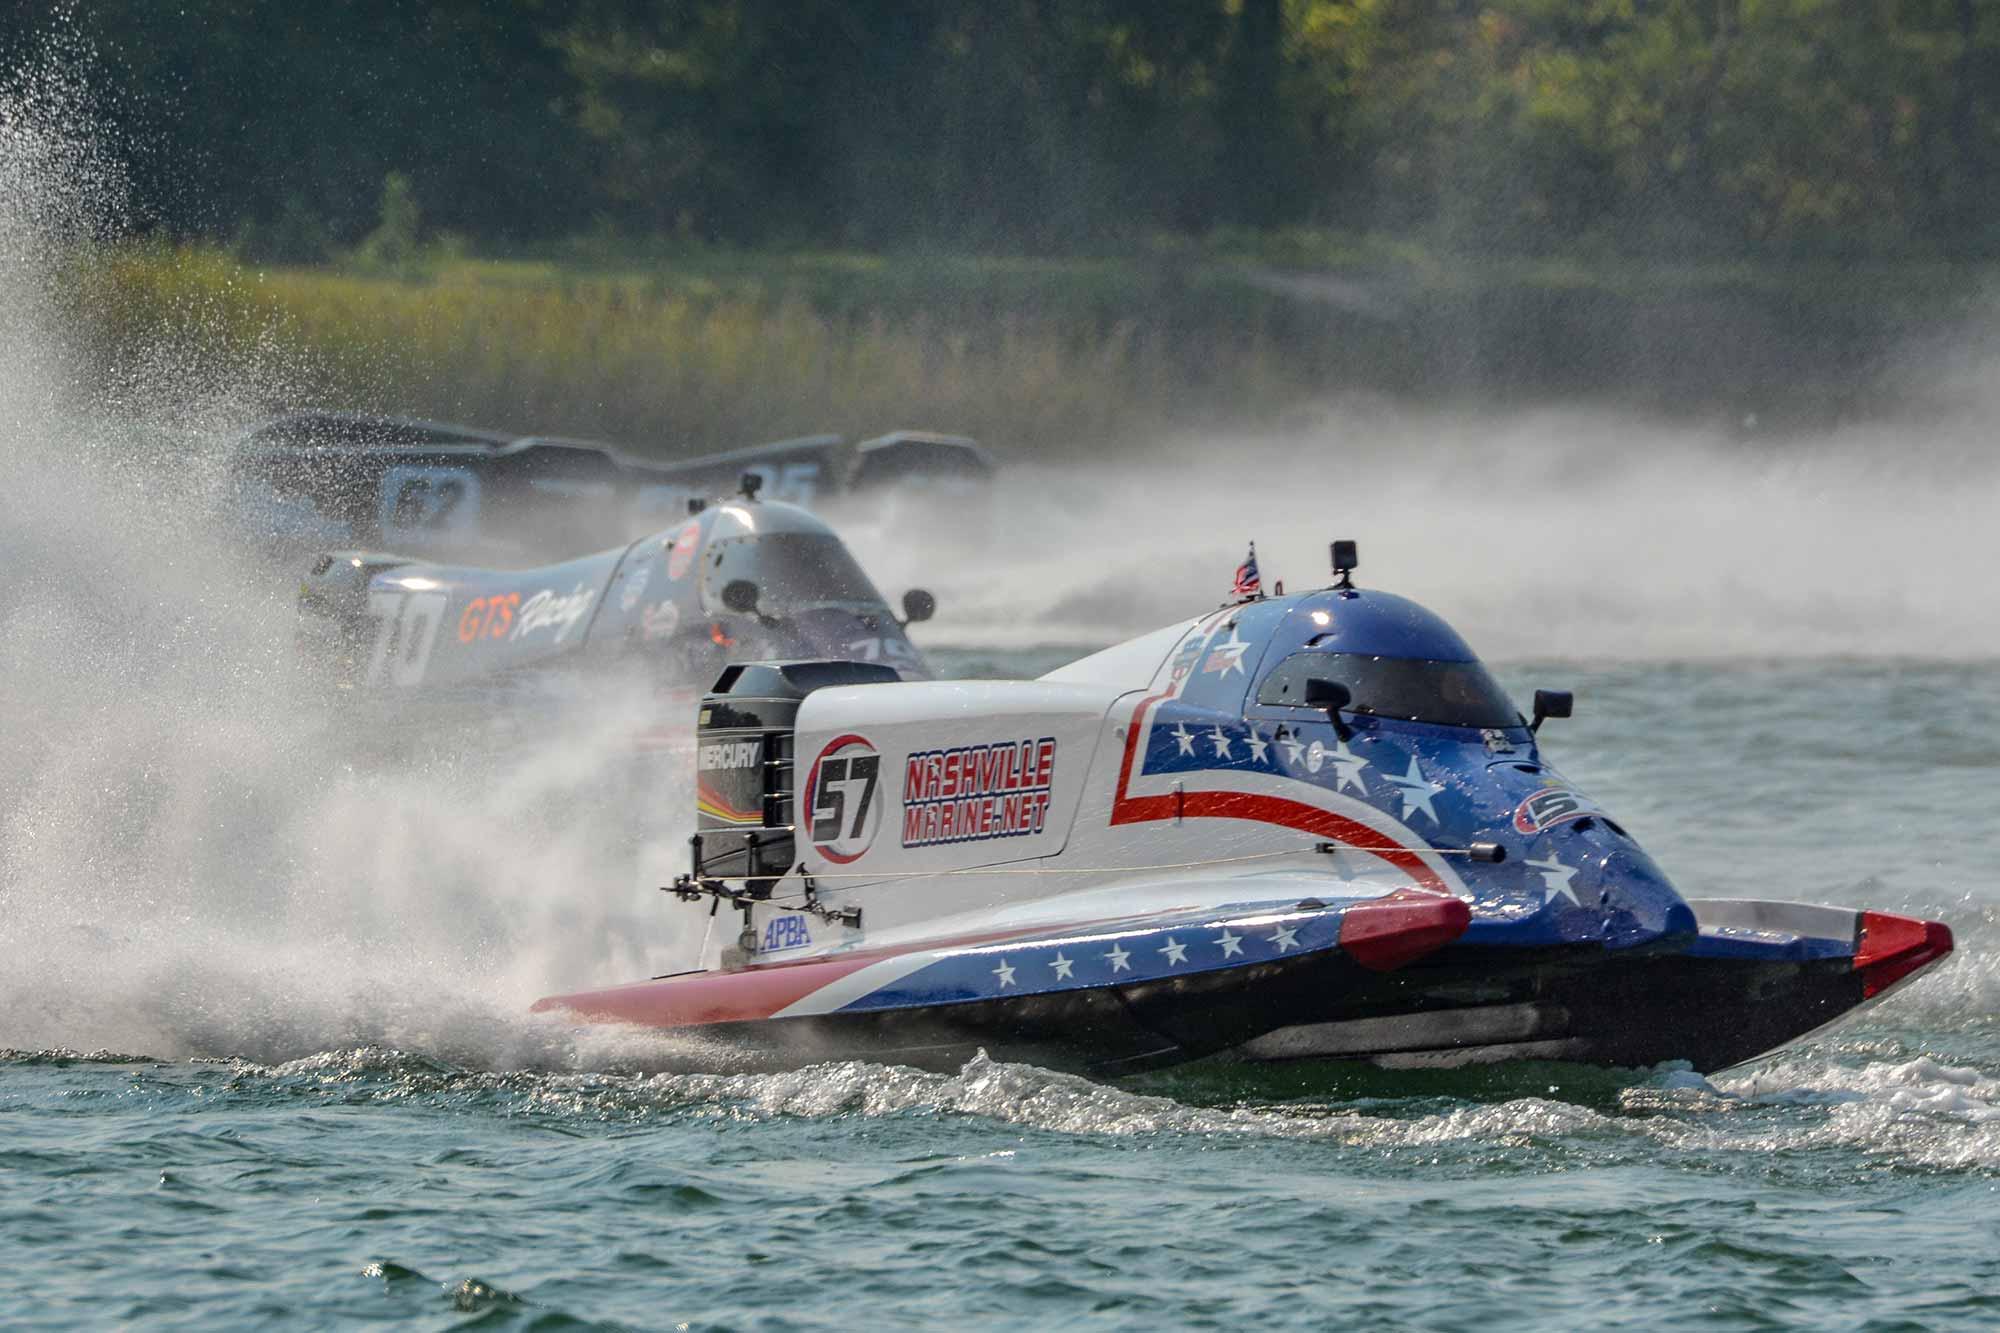 McMurray-Racing-Nashvill-Marine-2021-Springfield-F1-Race-69